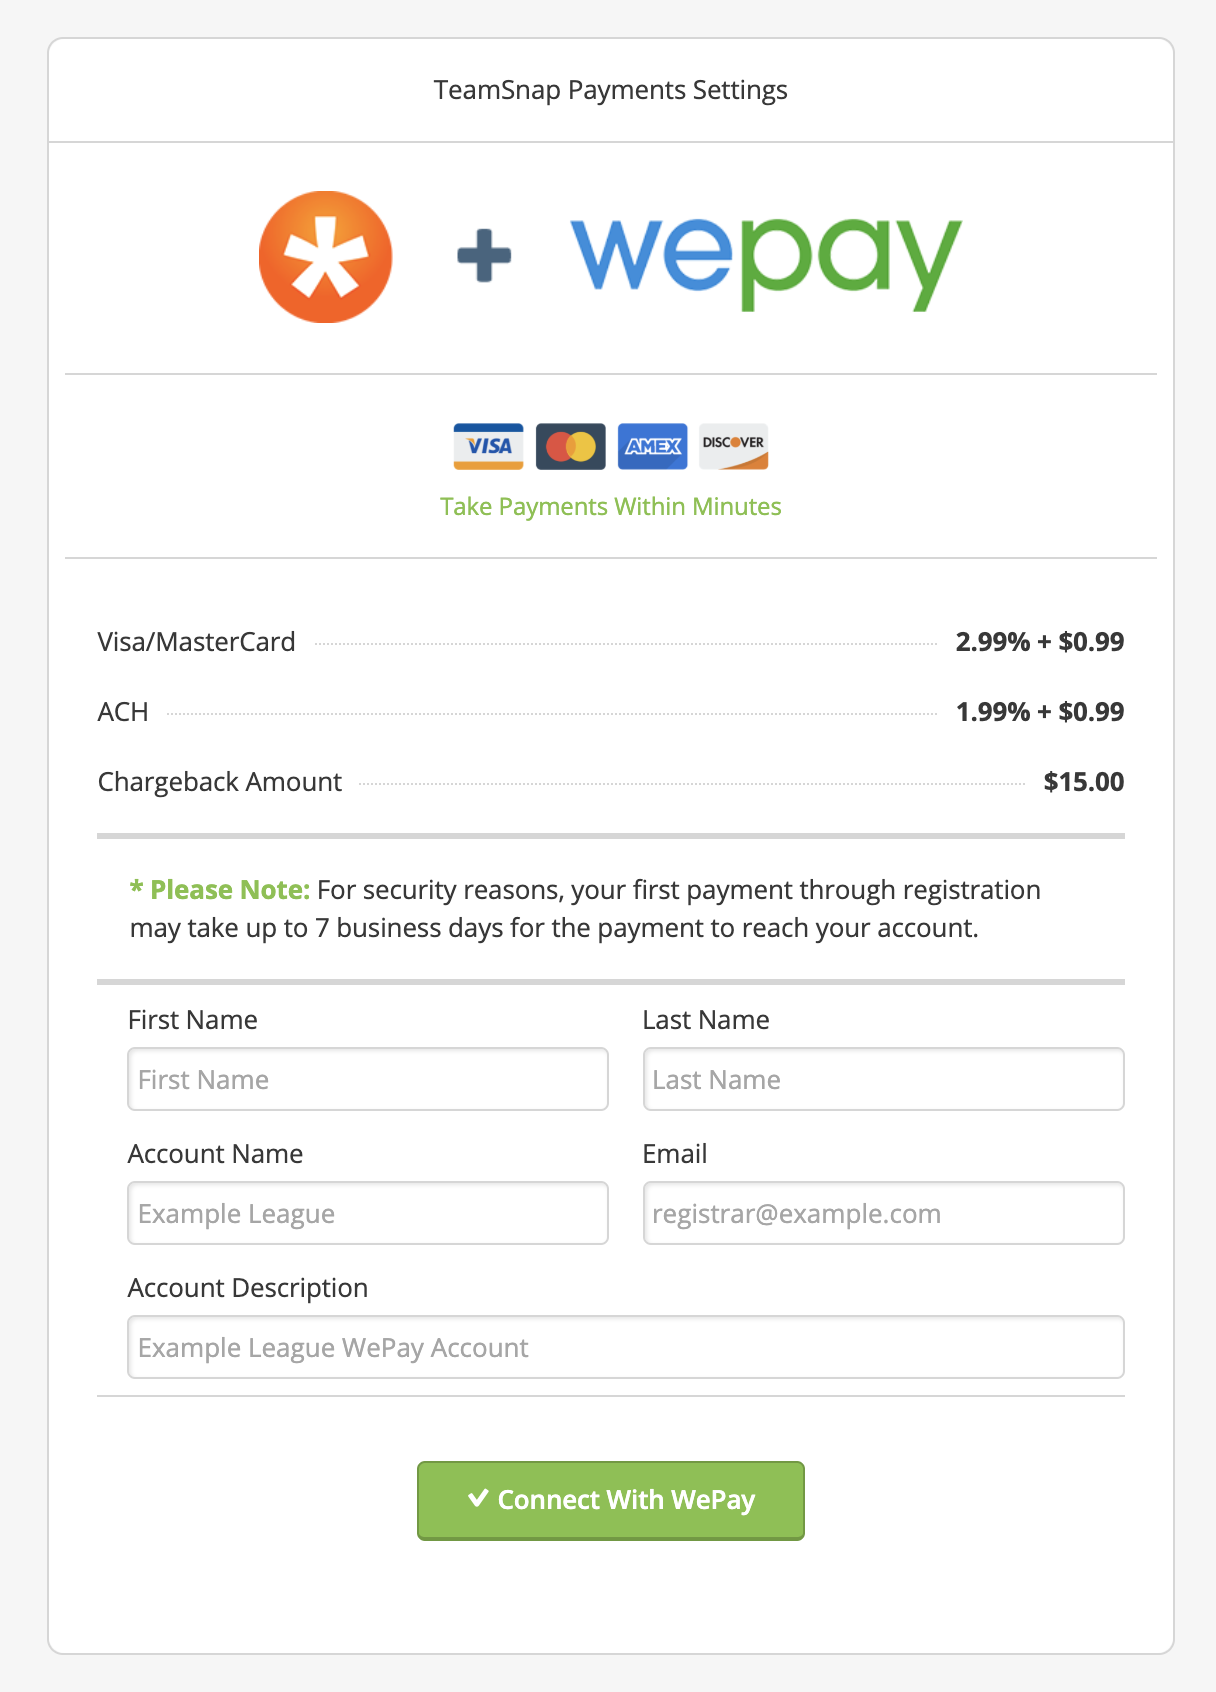 Set Registration Payment Methods & Automatic Adjustments